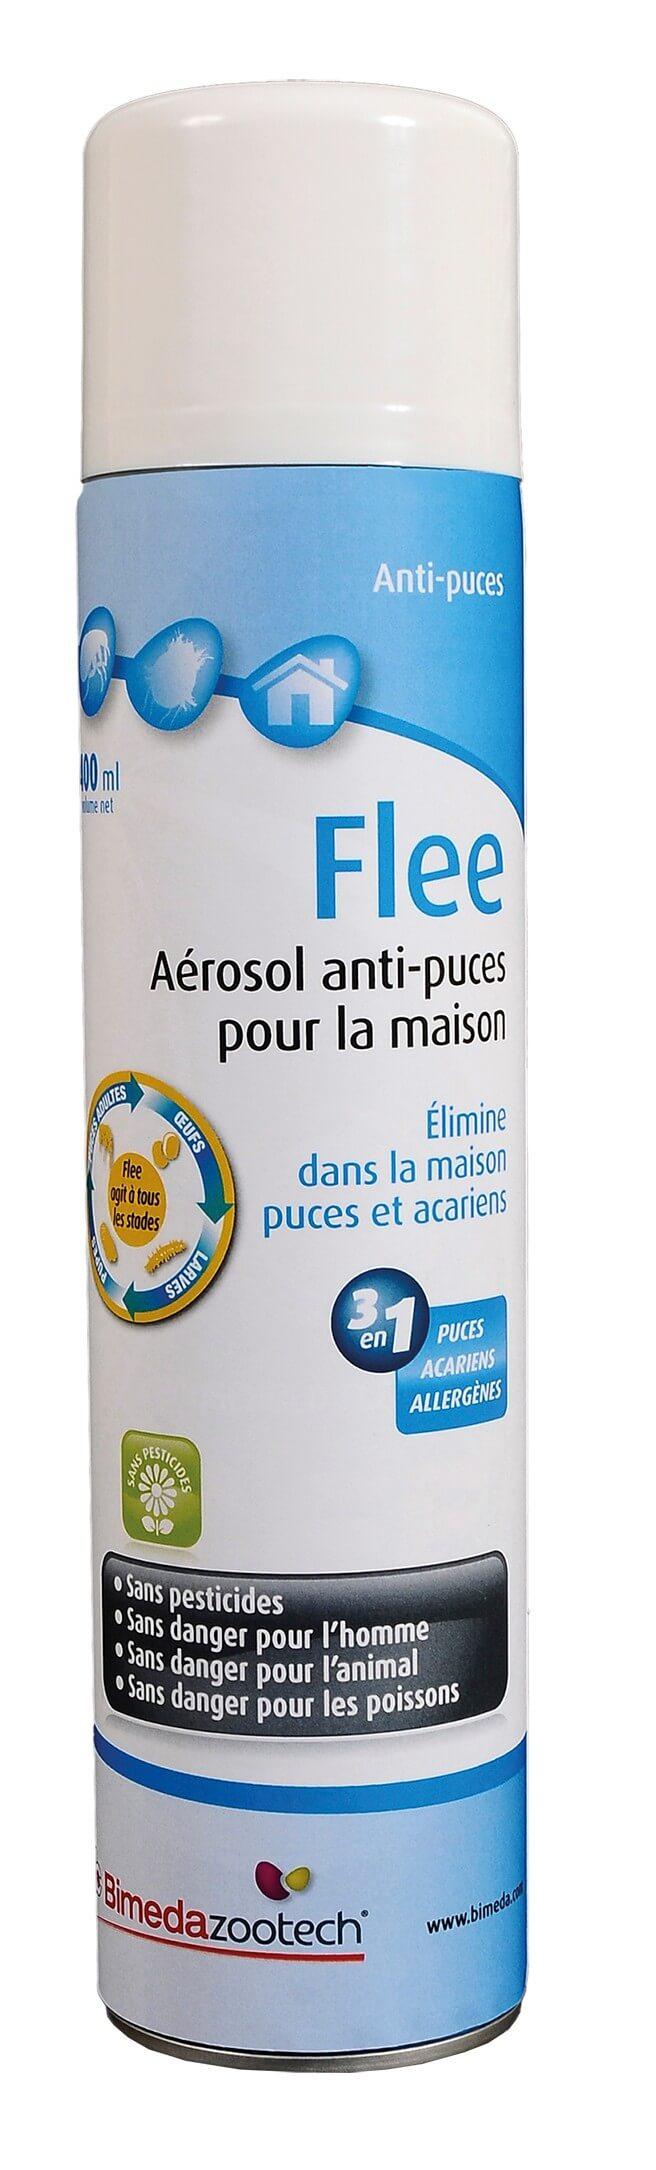 Flee Aerosol 400 Ml La Compagnie Des Animaux